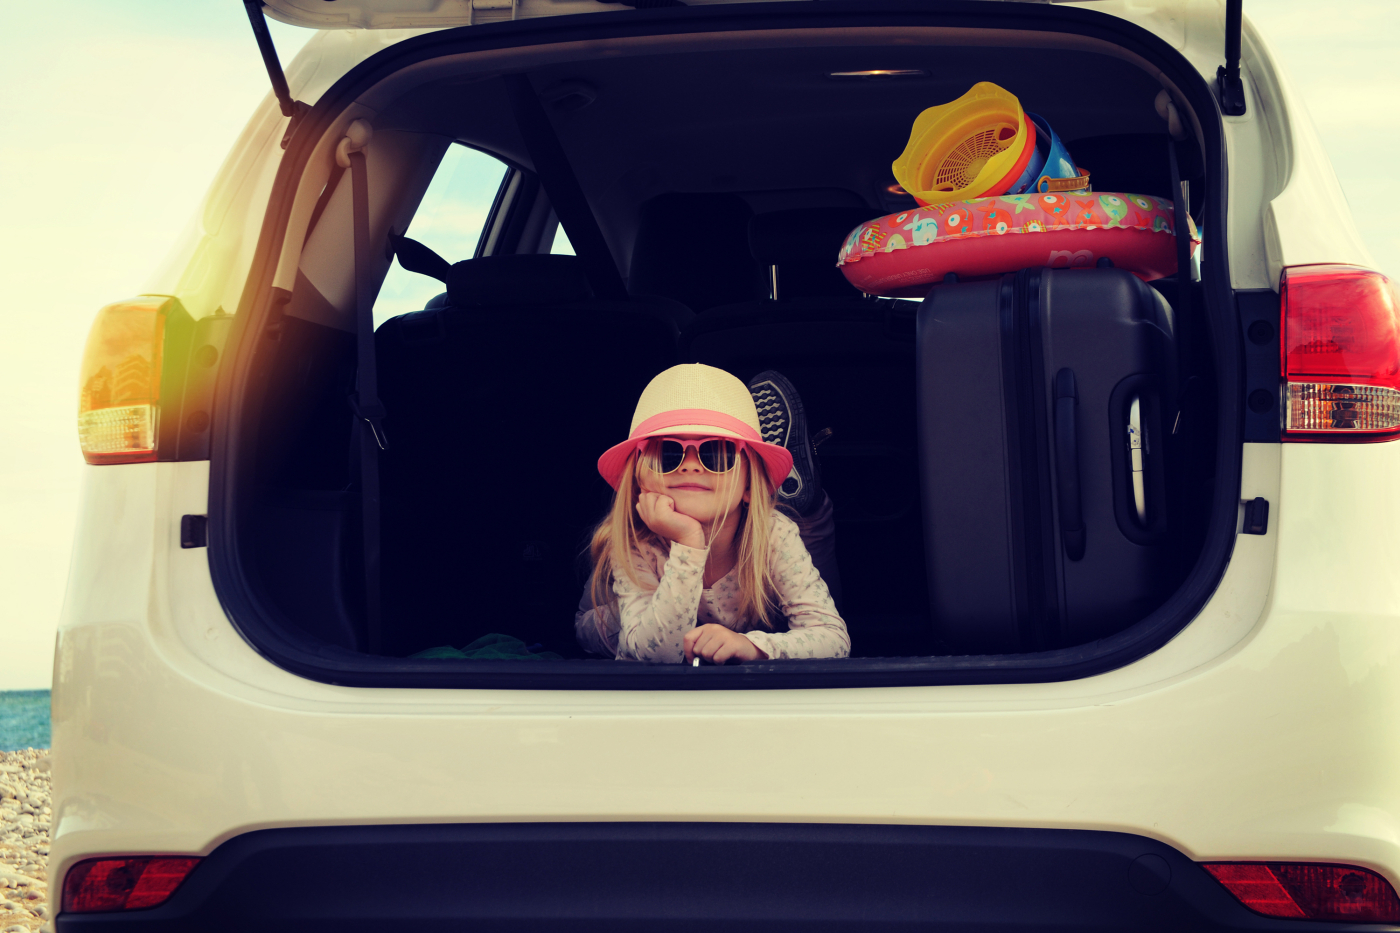 Sperrfristverkürzung und Verkehrstherapie